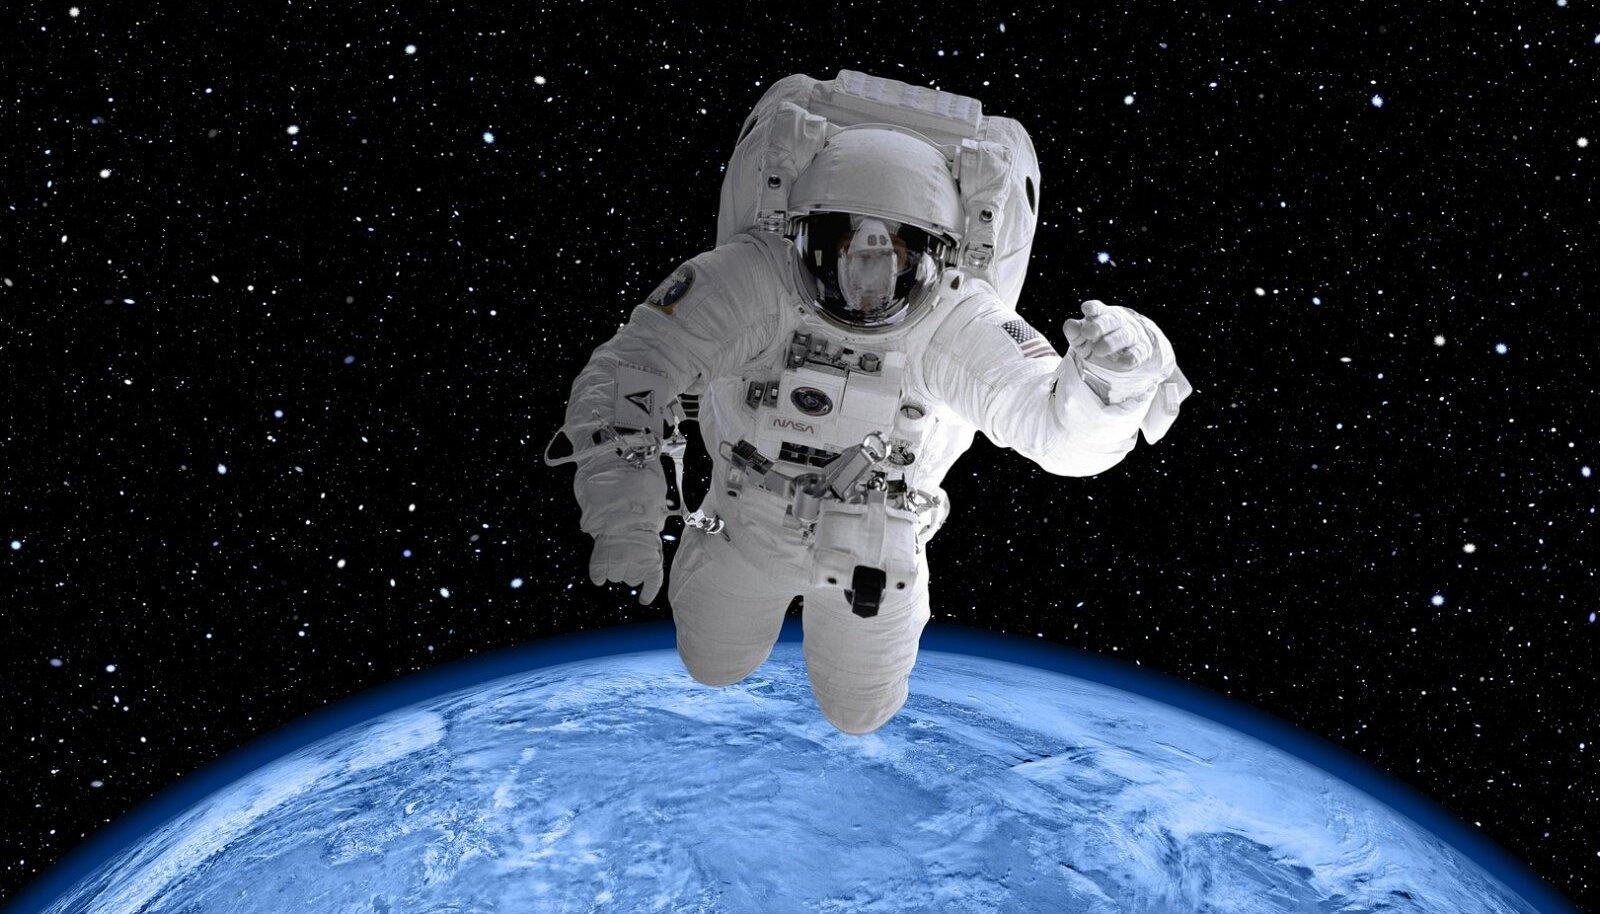 Illustratiivne pilt inimesest kosmoses (Foto: Pixabay / Gerd Altmann)